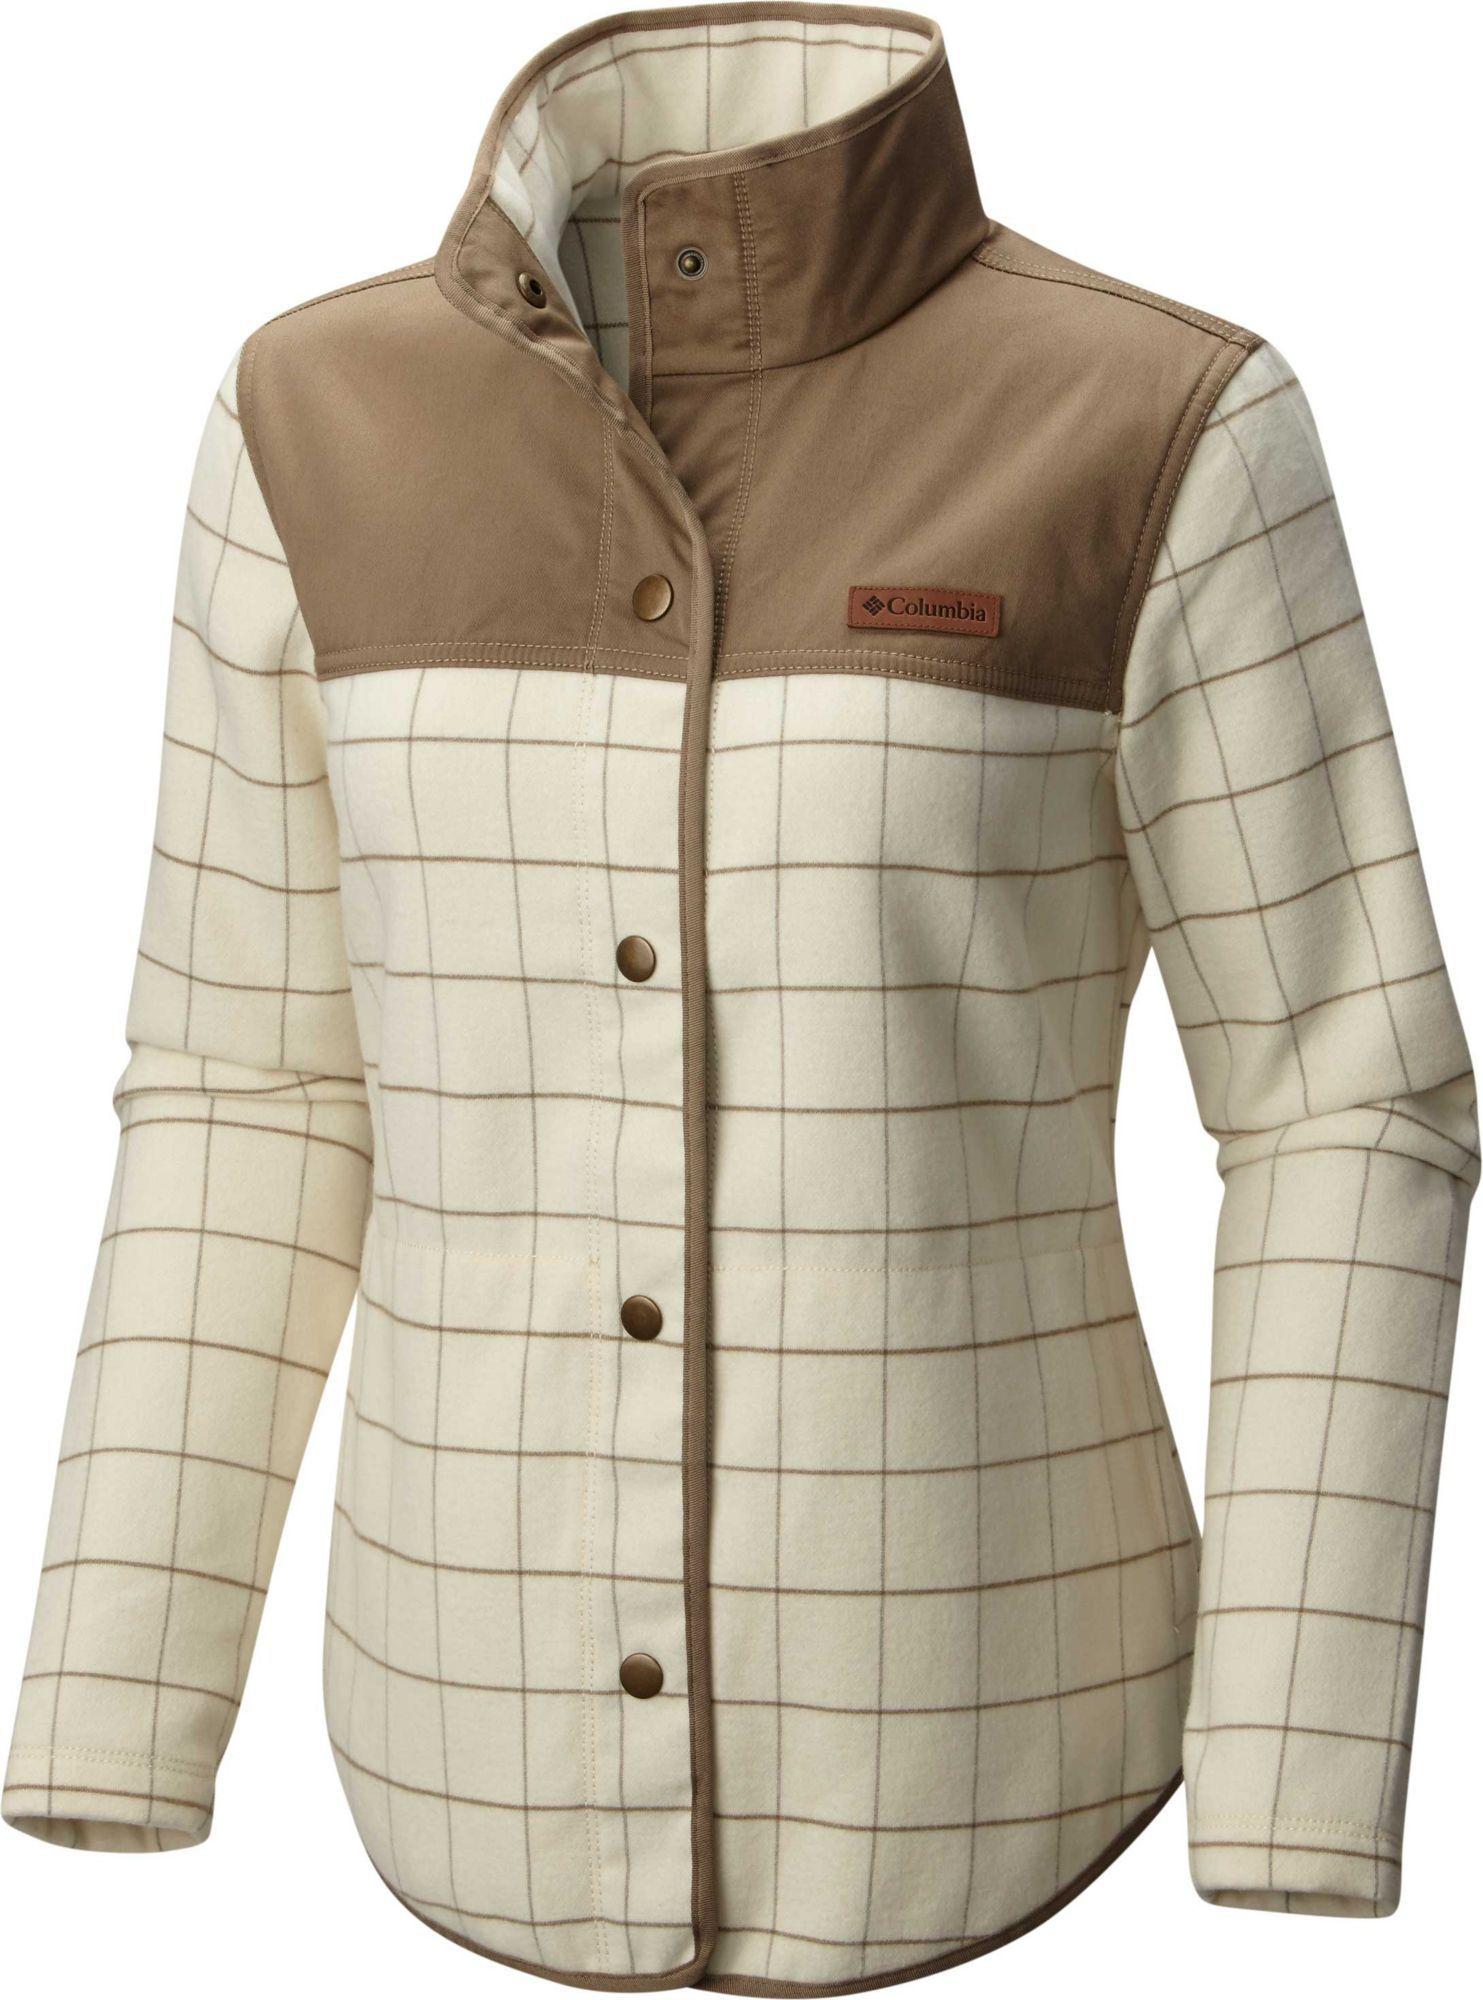 Columbia womenus alpine fleece jacket size xl chalk columbia